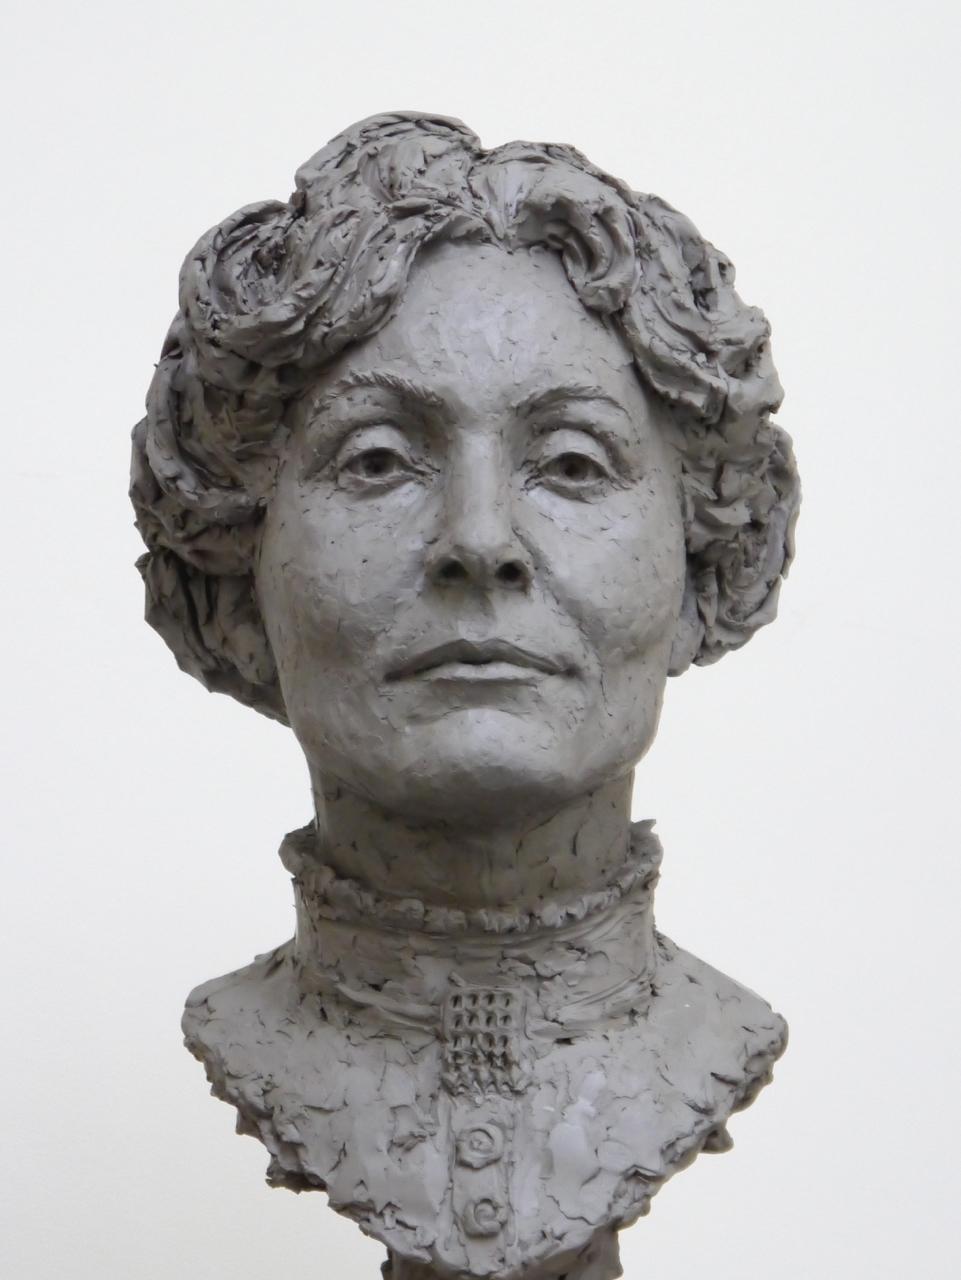 Emmeline Pankhurst commission